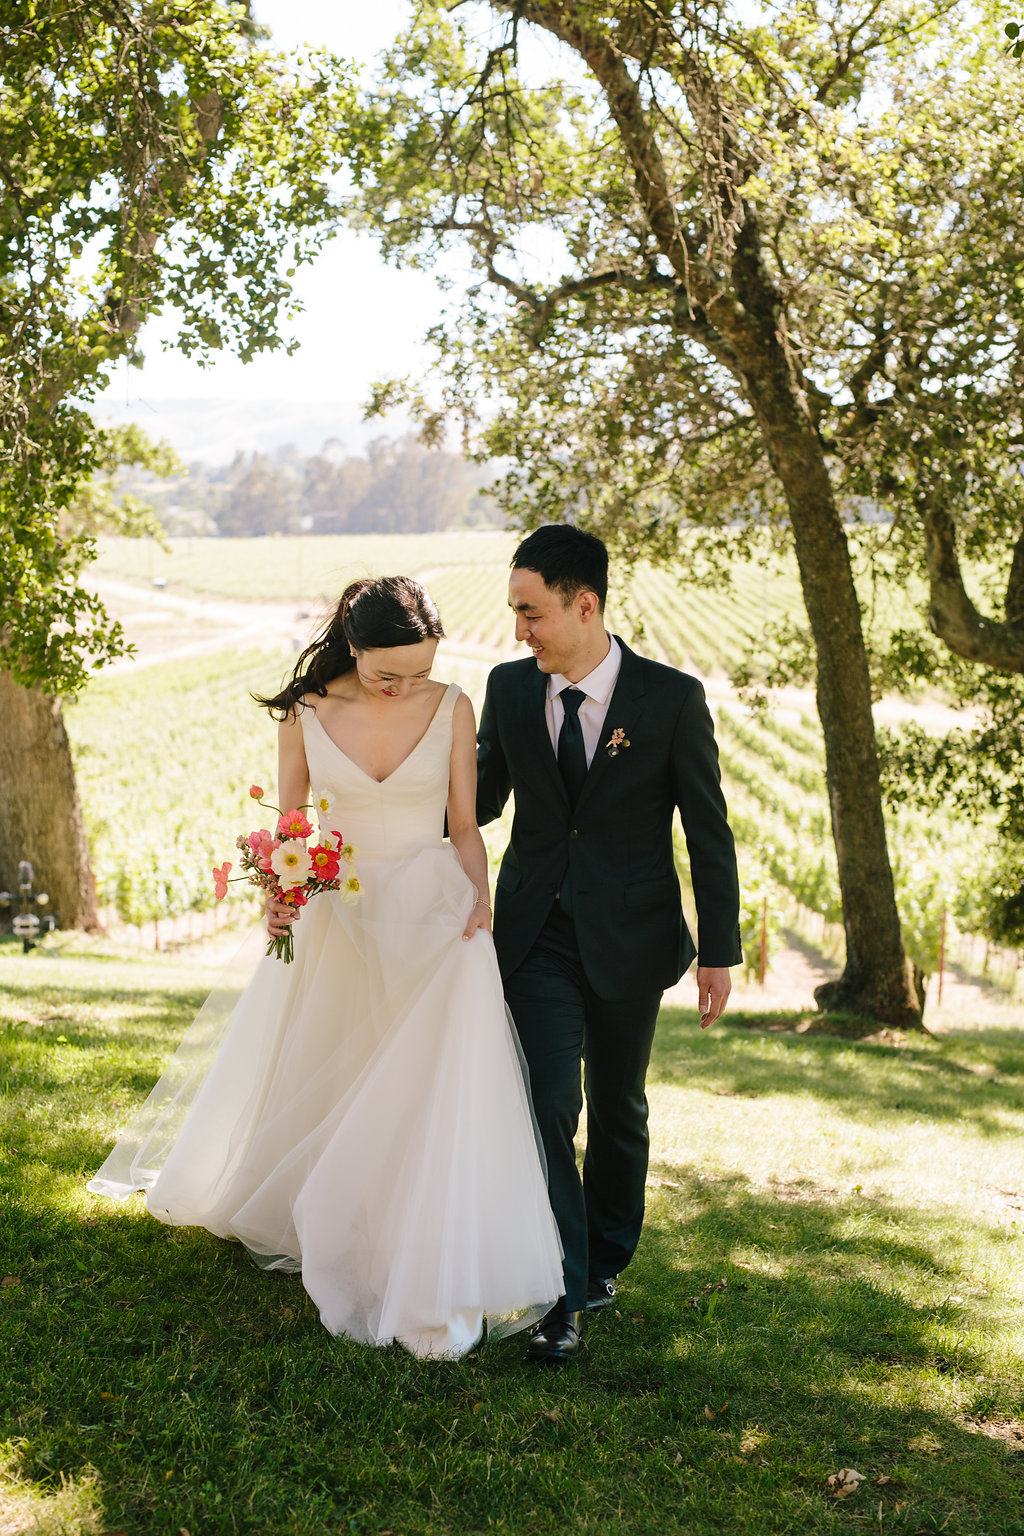 Simone-Anne-Wan-Mariola-Scribe-Winery-Wedding-Sneak-Peek-5.jpg